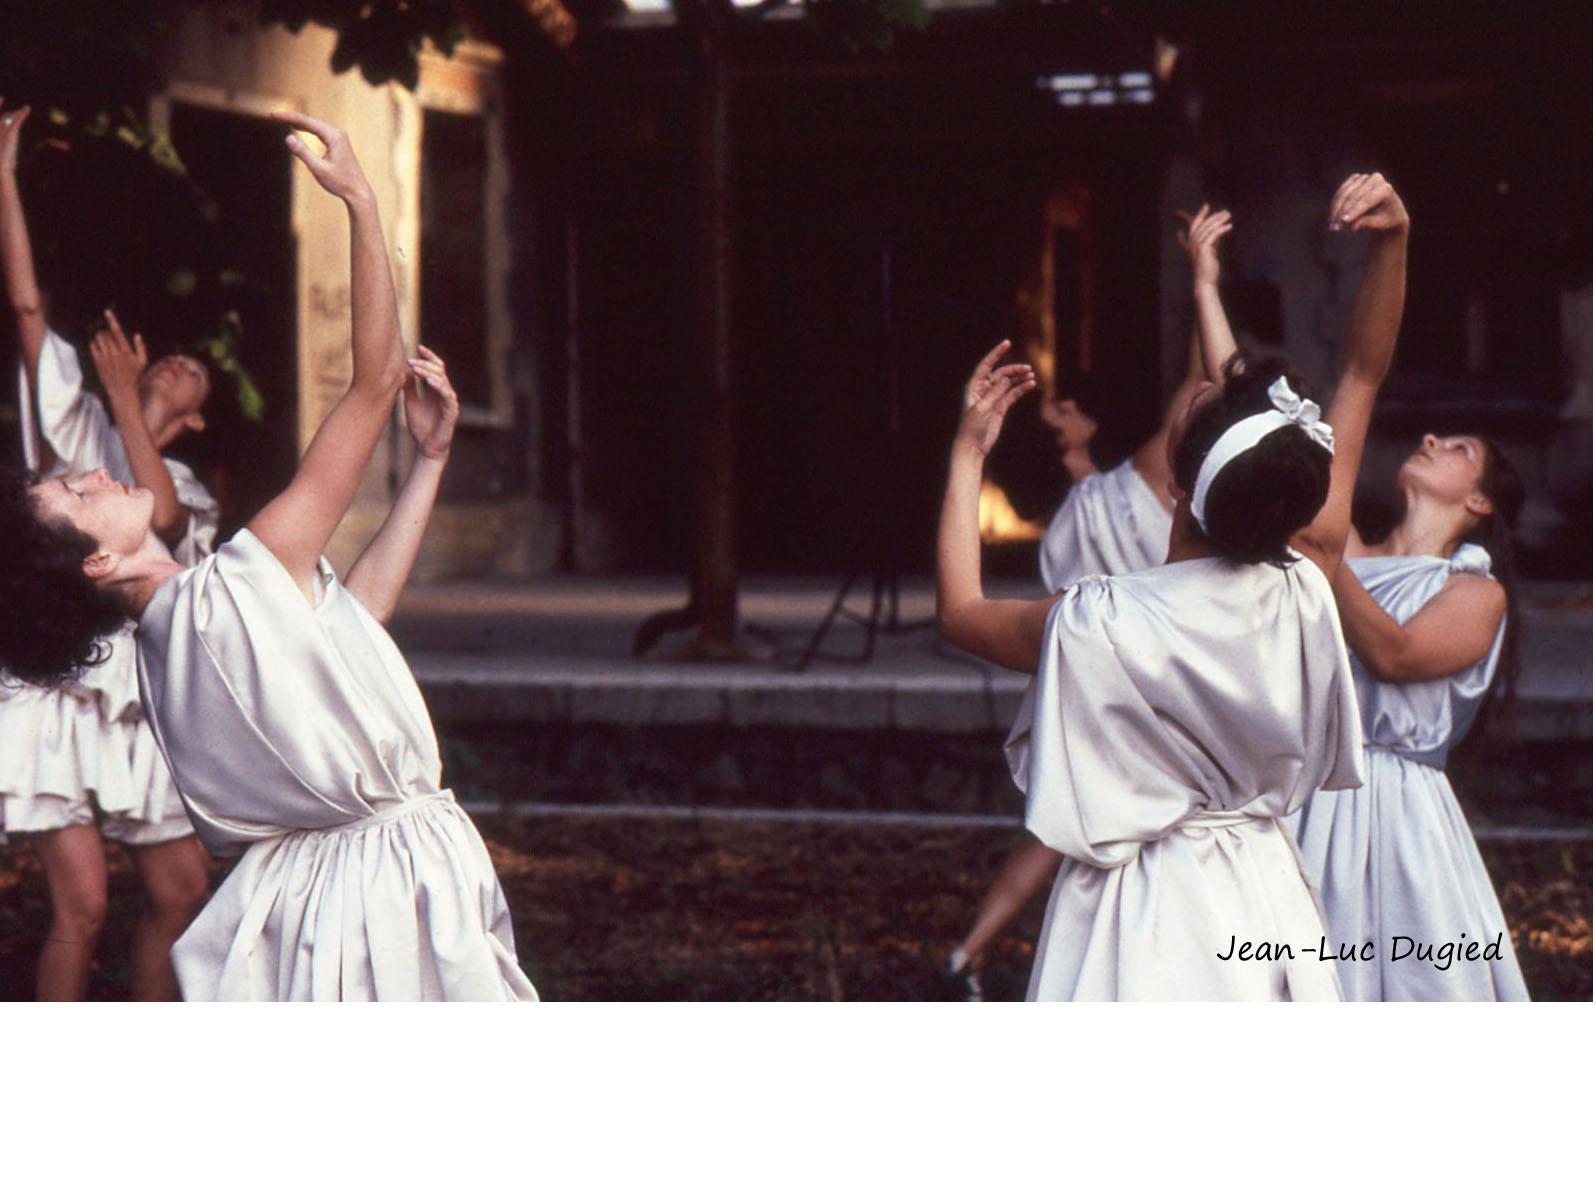 31 Duboc Odile - nuit hexoise - Aix - 1986